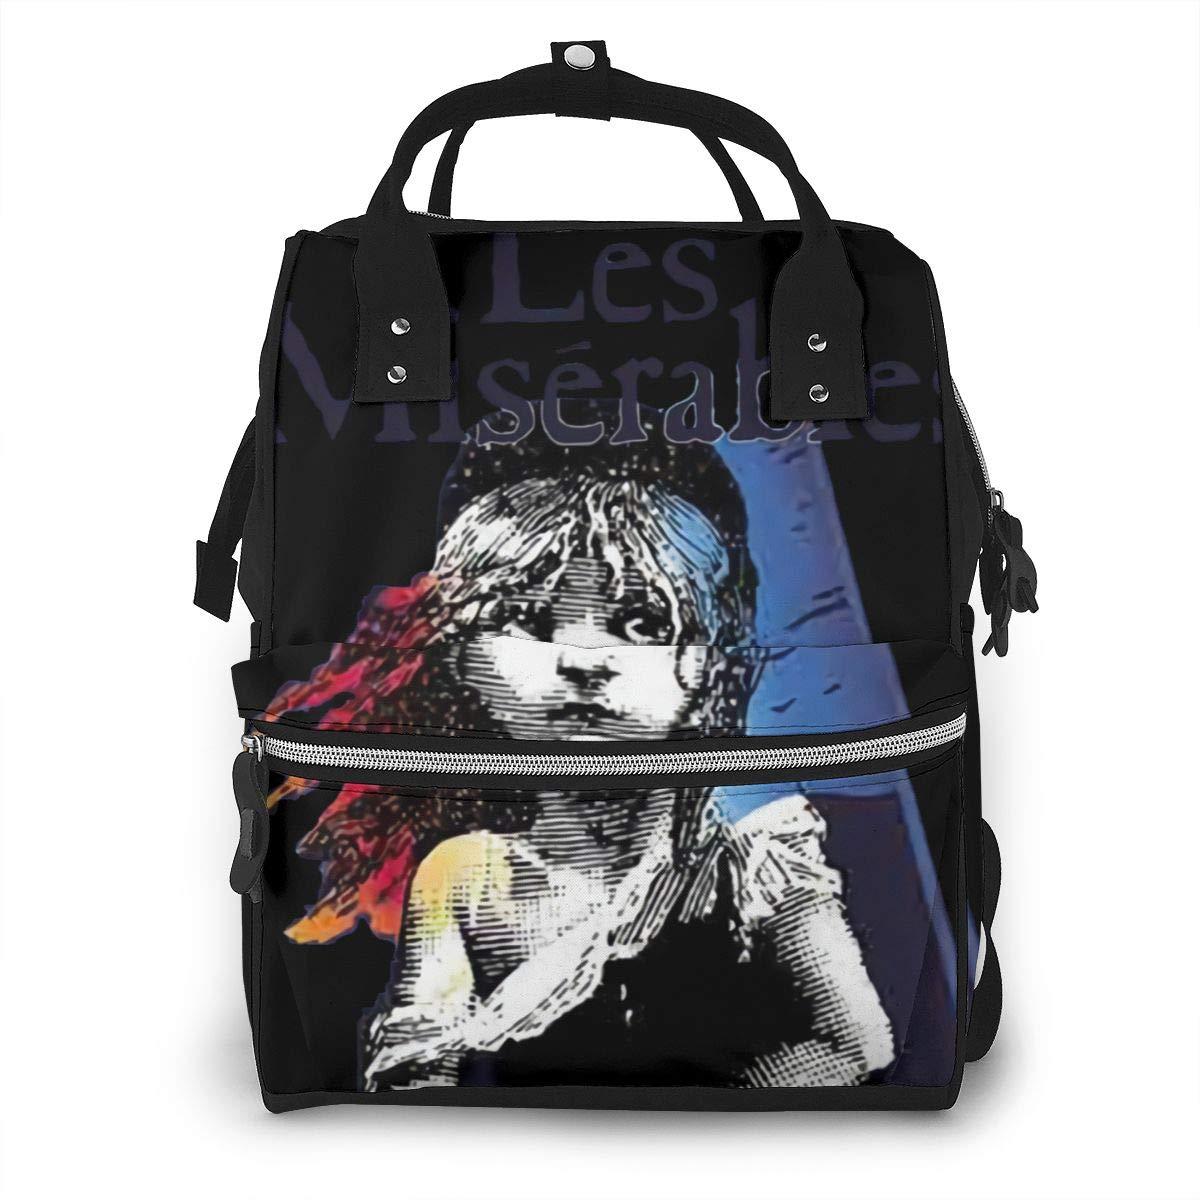 Les Miserables Durable, Large Capacity, Stylish, Adjustable Strap Length Mummy Backpack